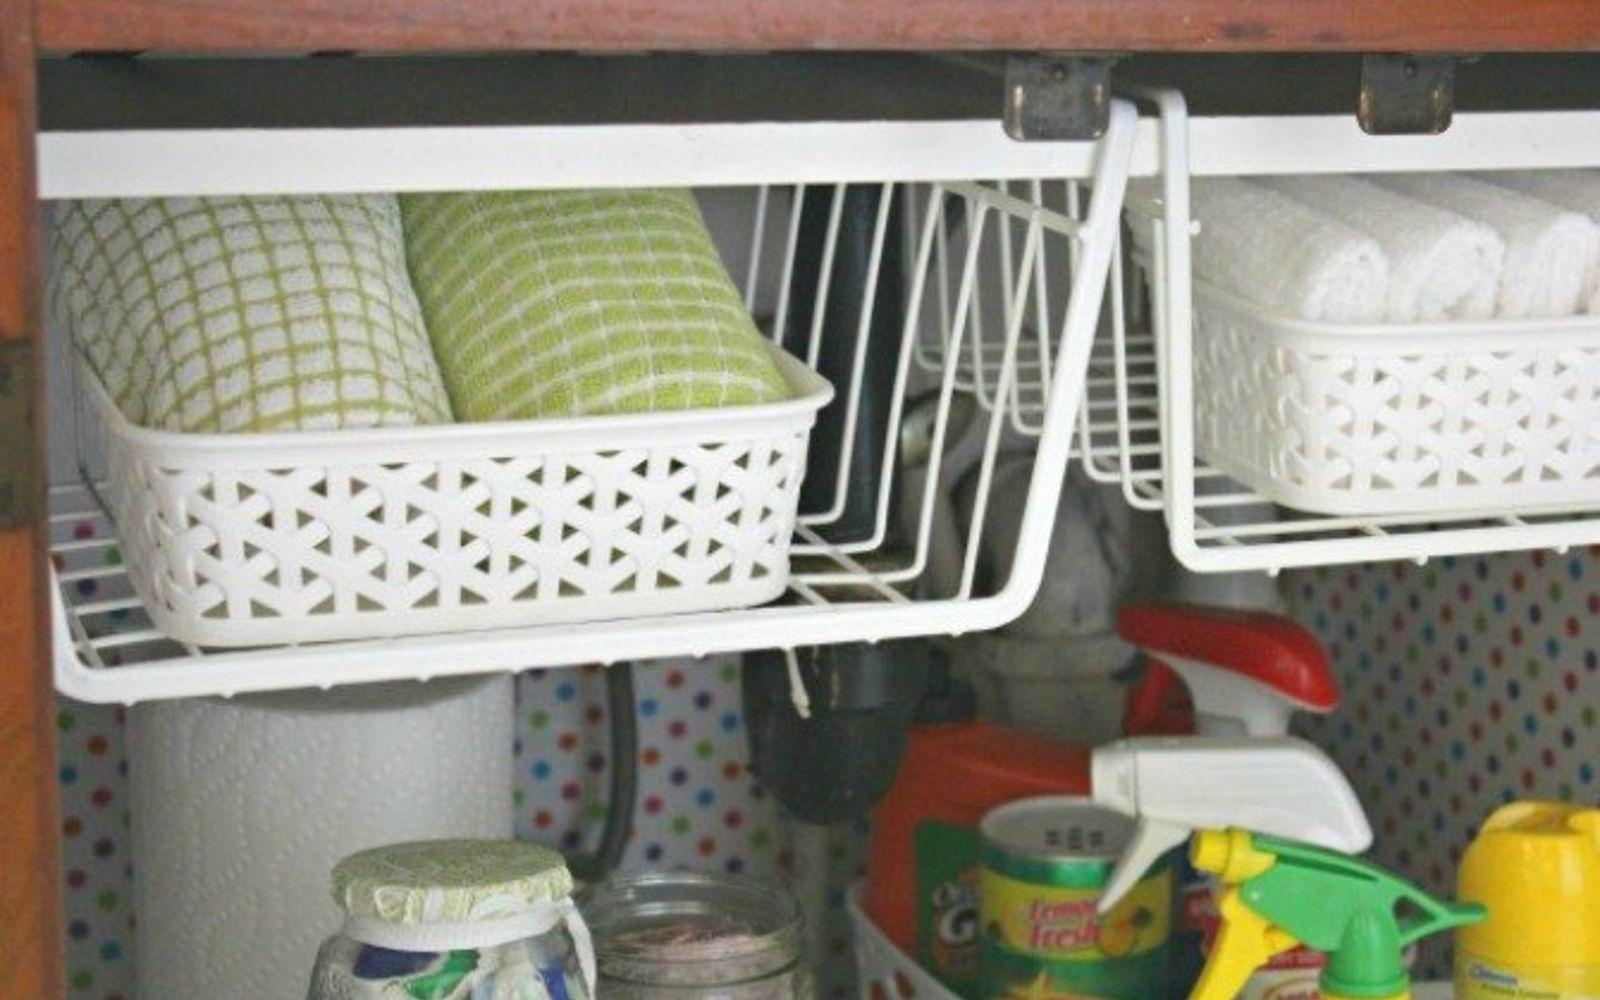 Kitchen Sink Organizer Ideas how to keep dirty kitchen spots clean and fresh much longer | hometalk